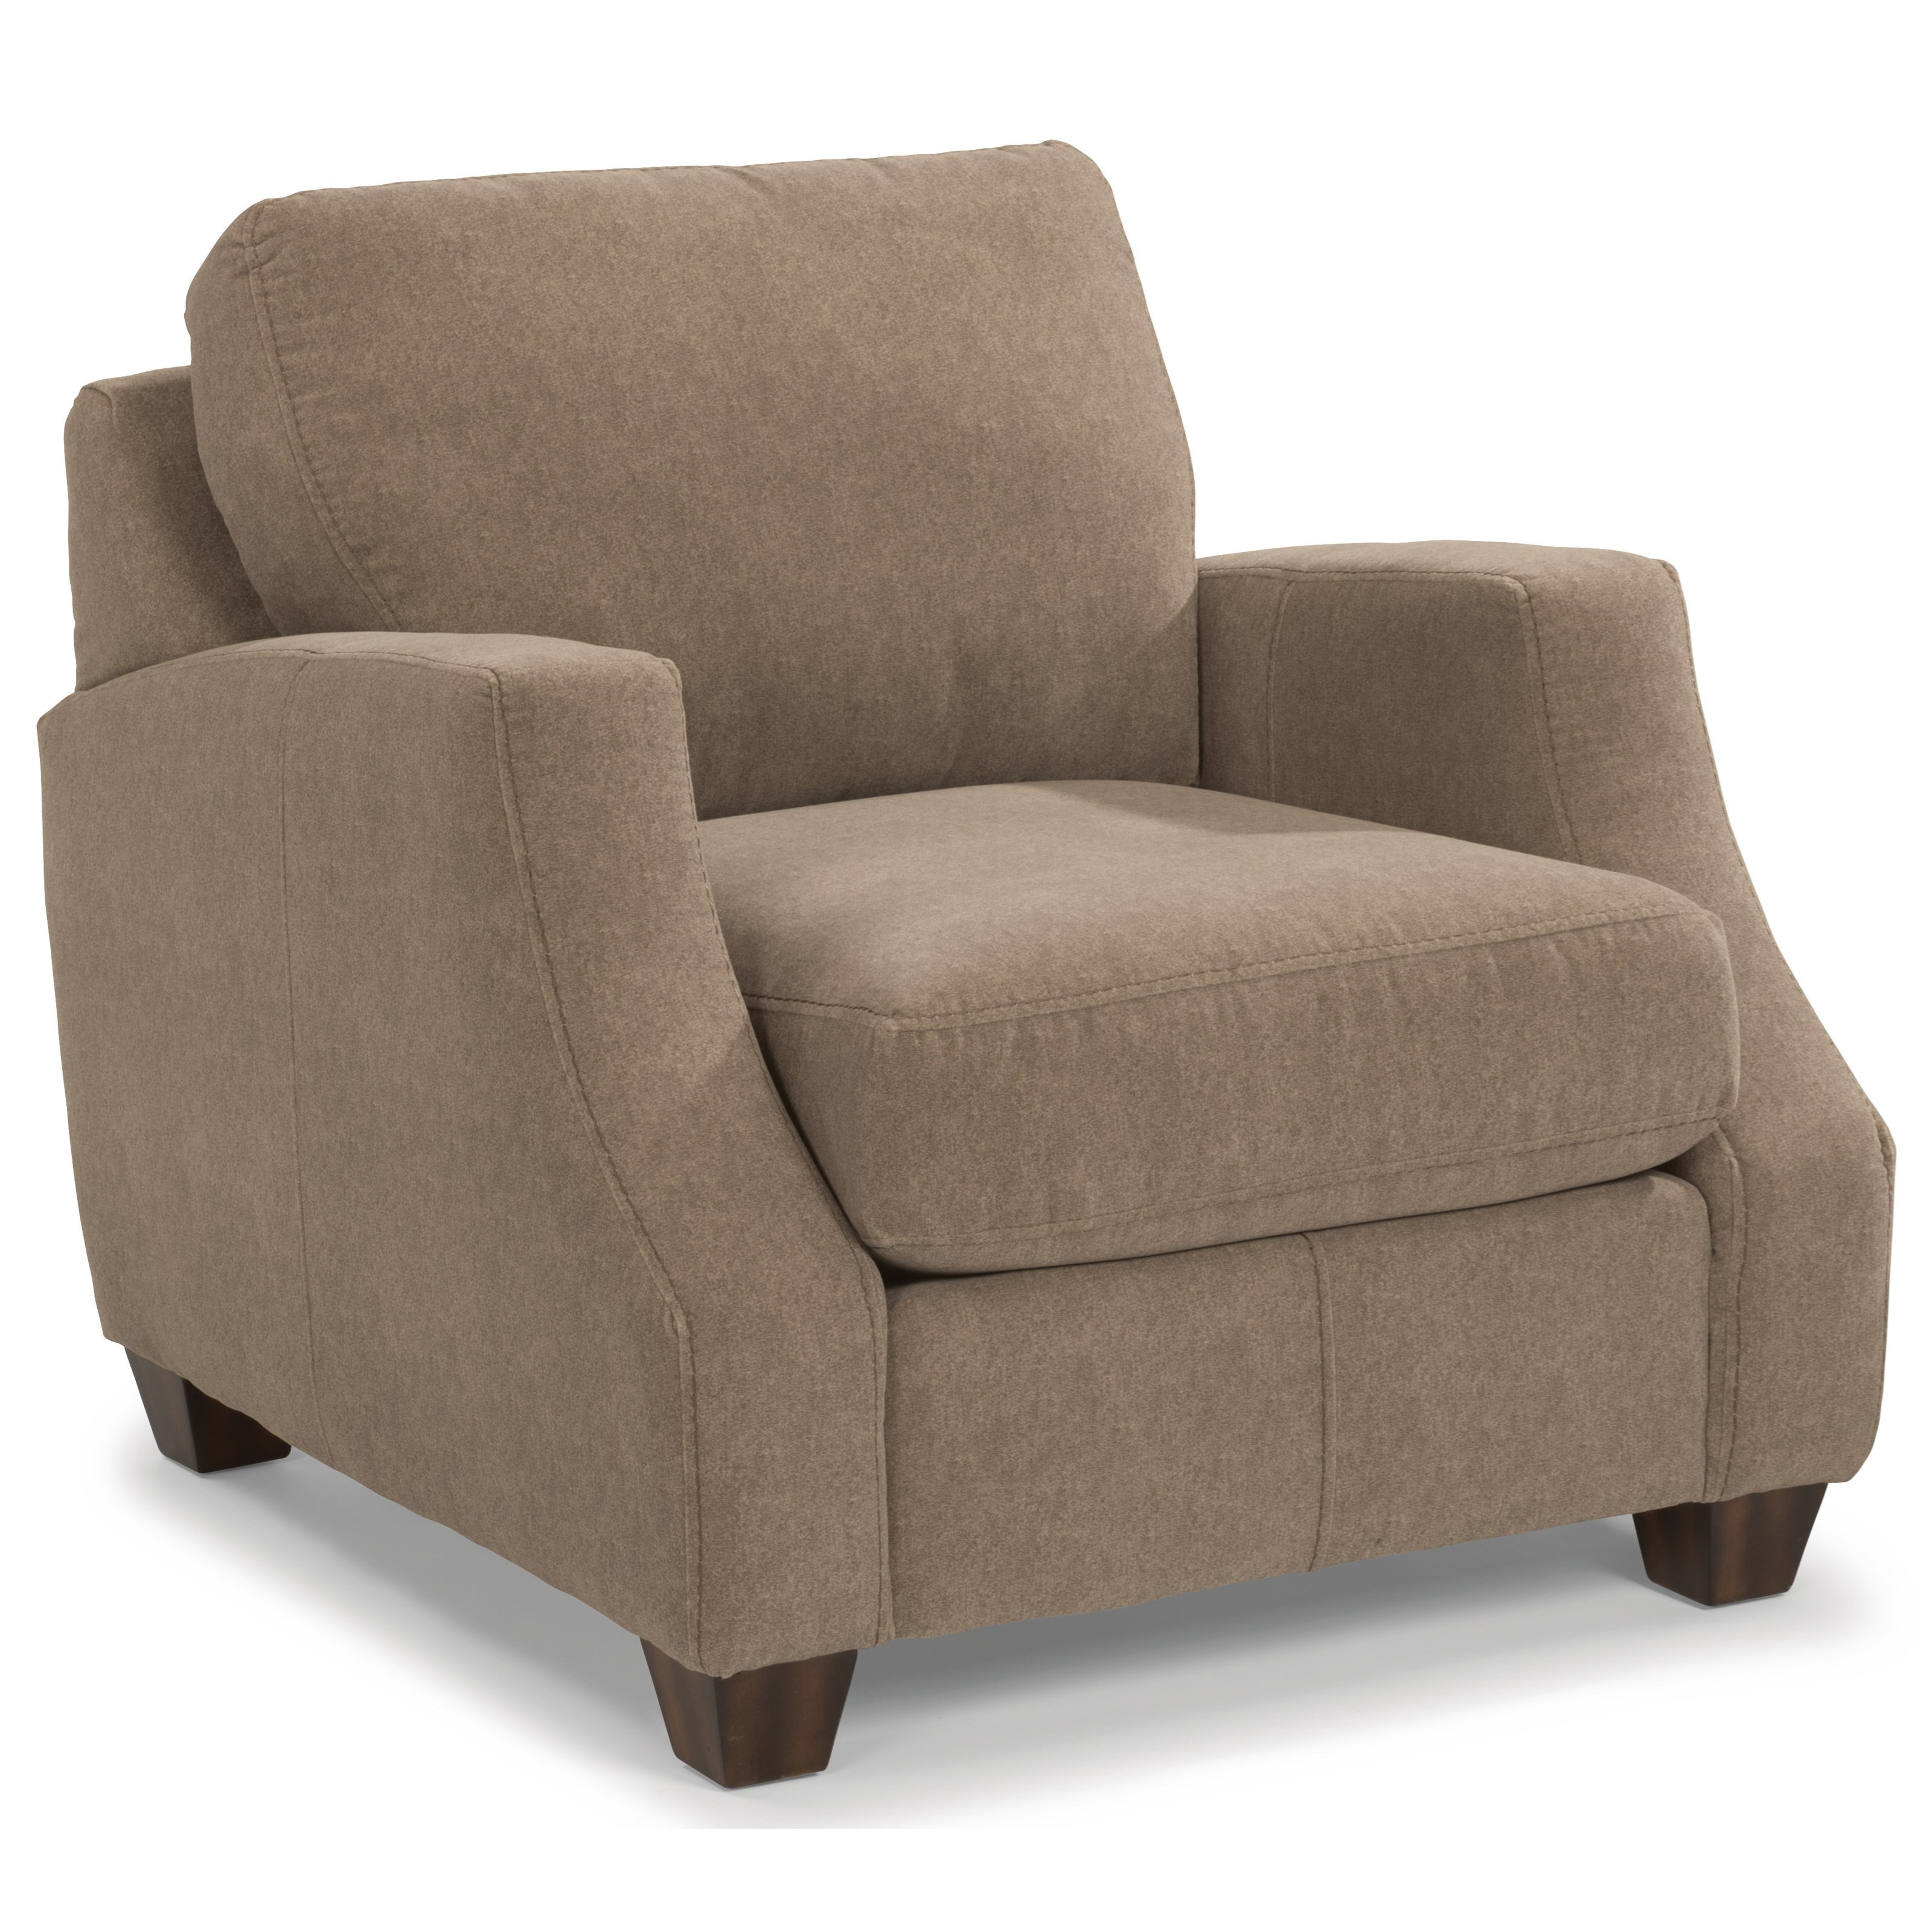 Flexsteel Grayson Contemporary Chair And Ottoman Set John V Schultz Furniture Chair Ottoman